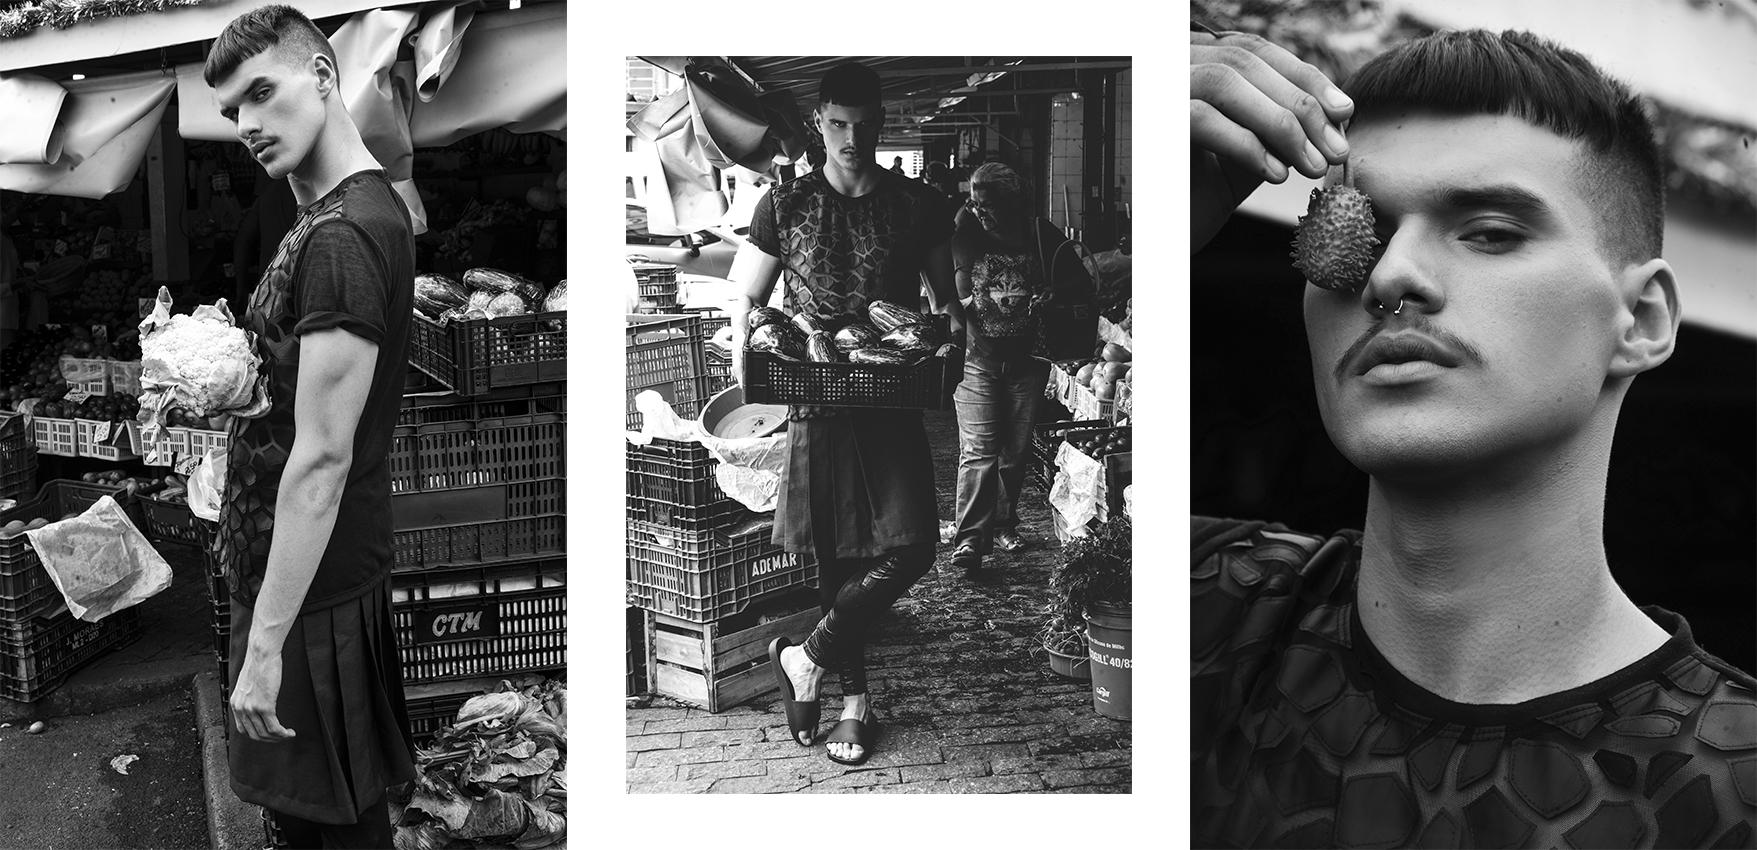 editorial de moda, moda masculina, moda sem censura, alex cursino, rodrigo marconatto, arnaldo dalmiglio, dicas de moda, magazine, shooting 2017 (23)